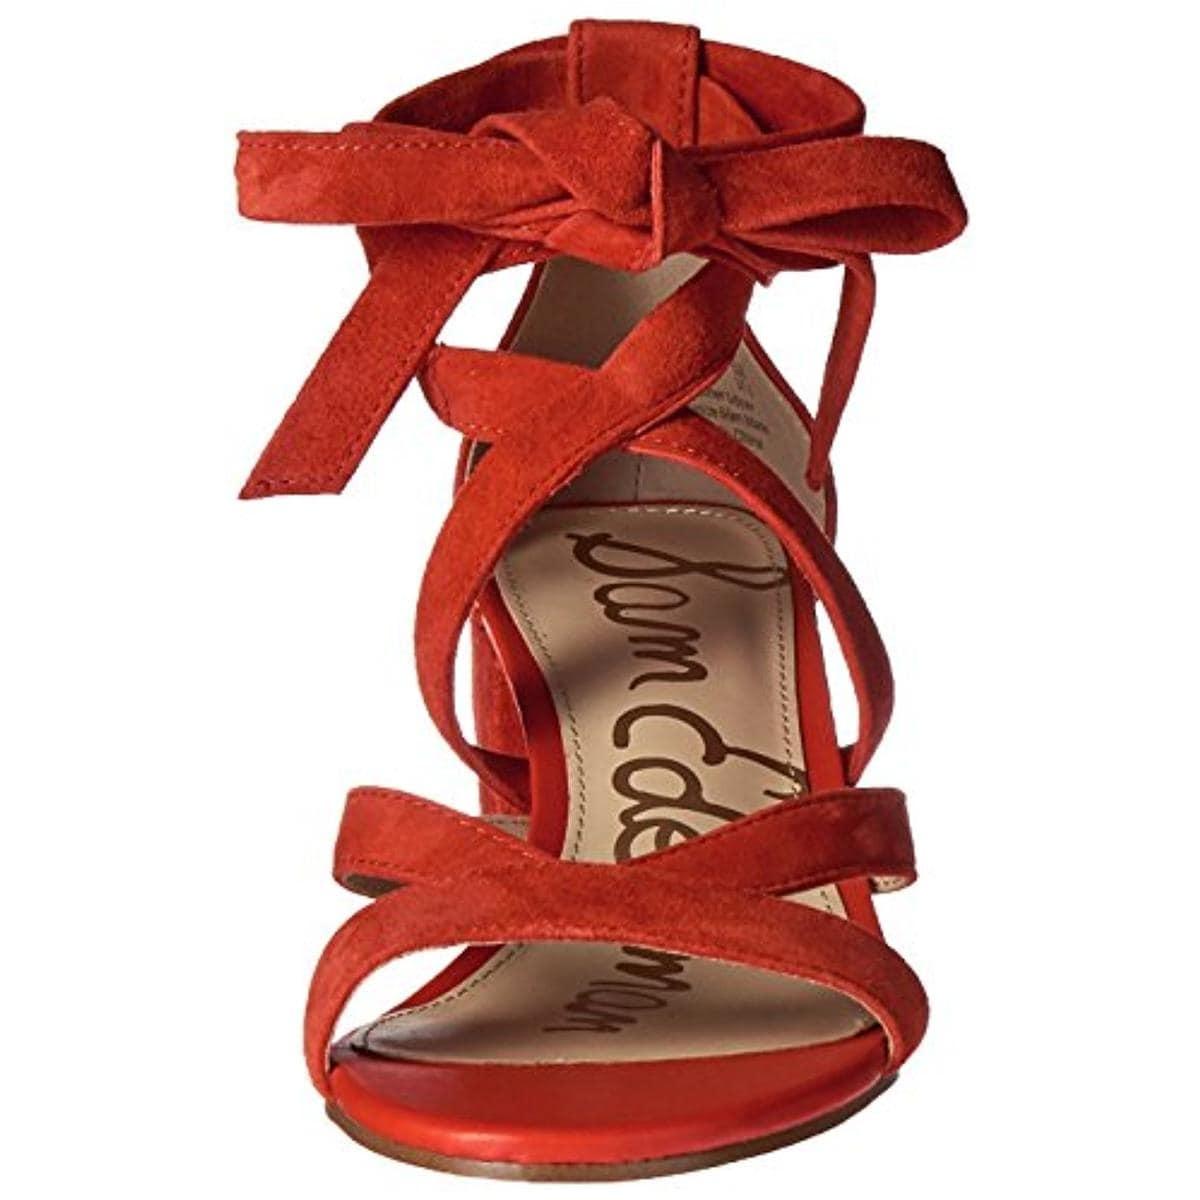 e12f3372e29 Shop Sam Edelman Womens Sheri Dress Sandals Suede Block Heel - Free  Shipping Today - Overstock - 17416159